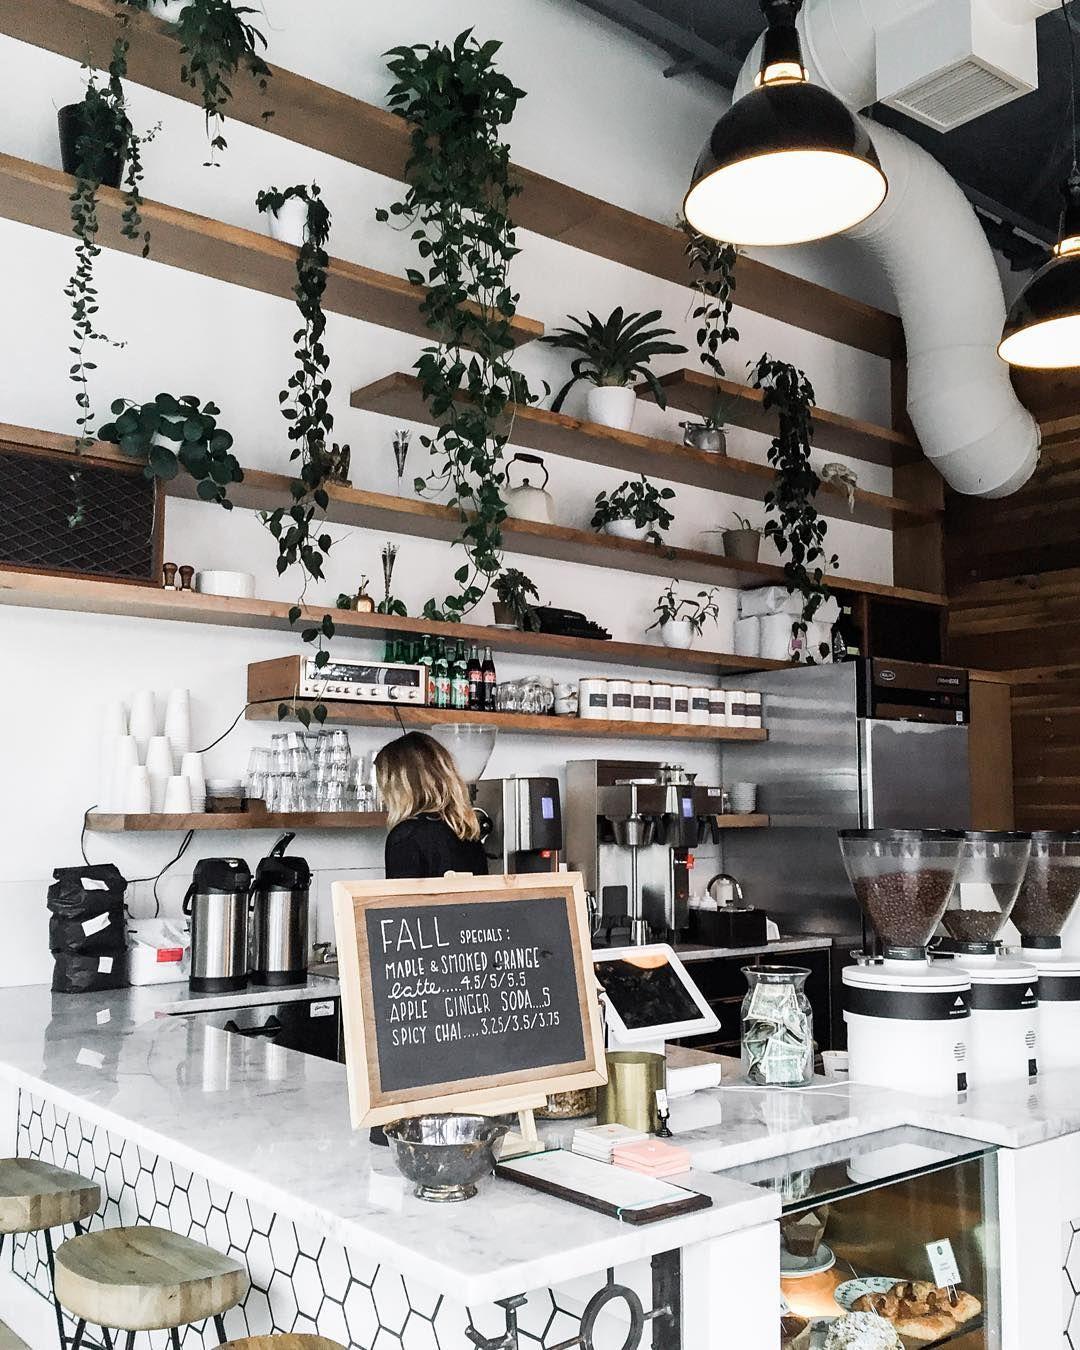 Bekijk deze instagram foto van jade melissa 2 283 vind for Raumgestaltung cafe